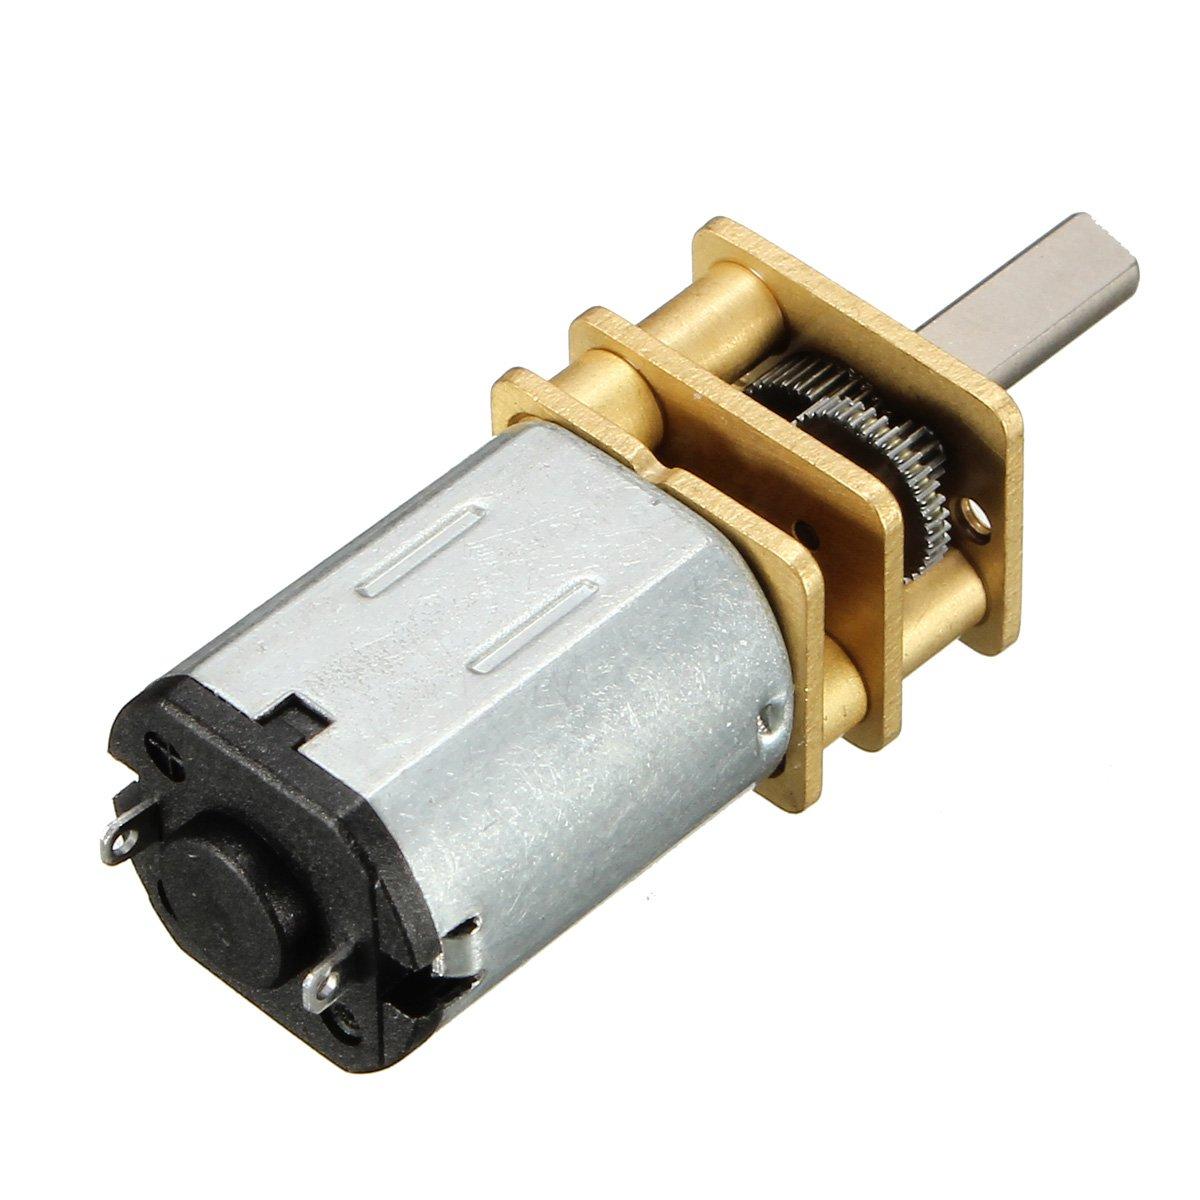 N20-12V-200 Rpm Micro Metal Gear Motor